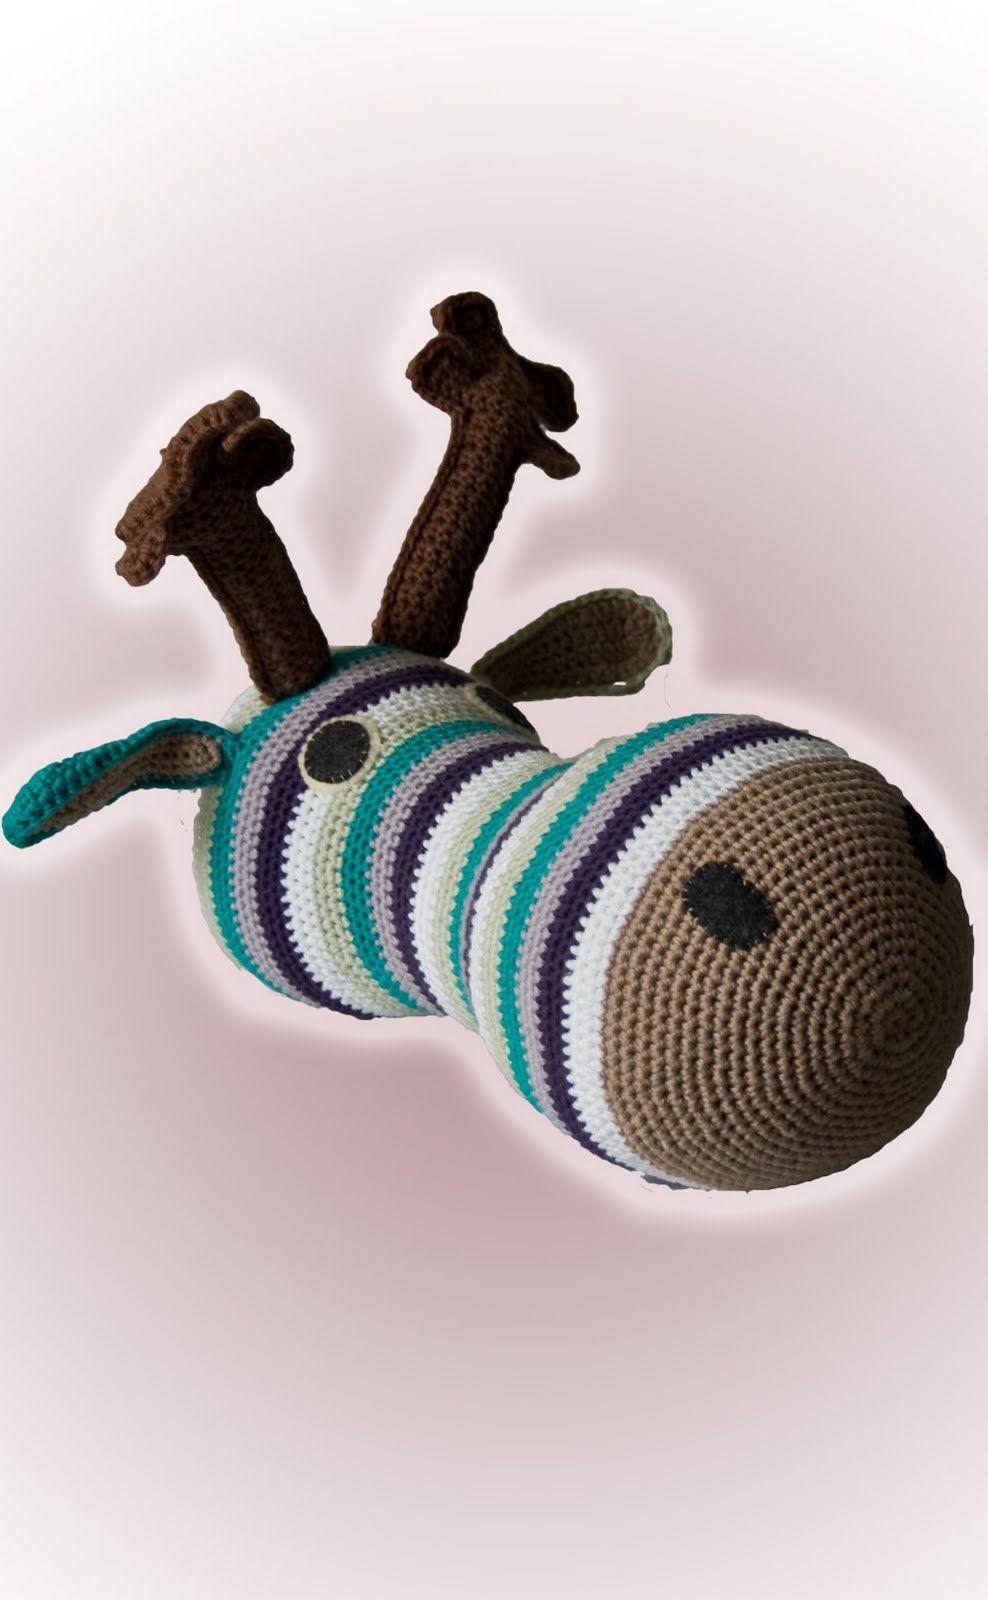 crochet moose pattern | crafts | Pinterest | Crochet, Patterns and ...